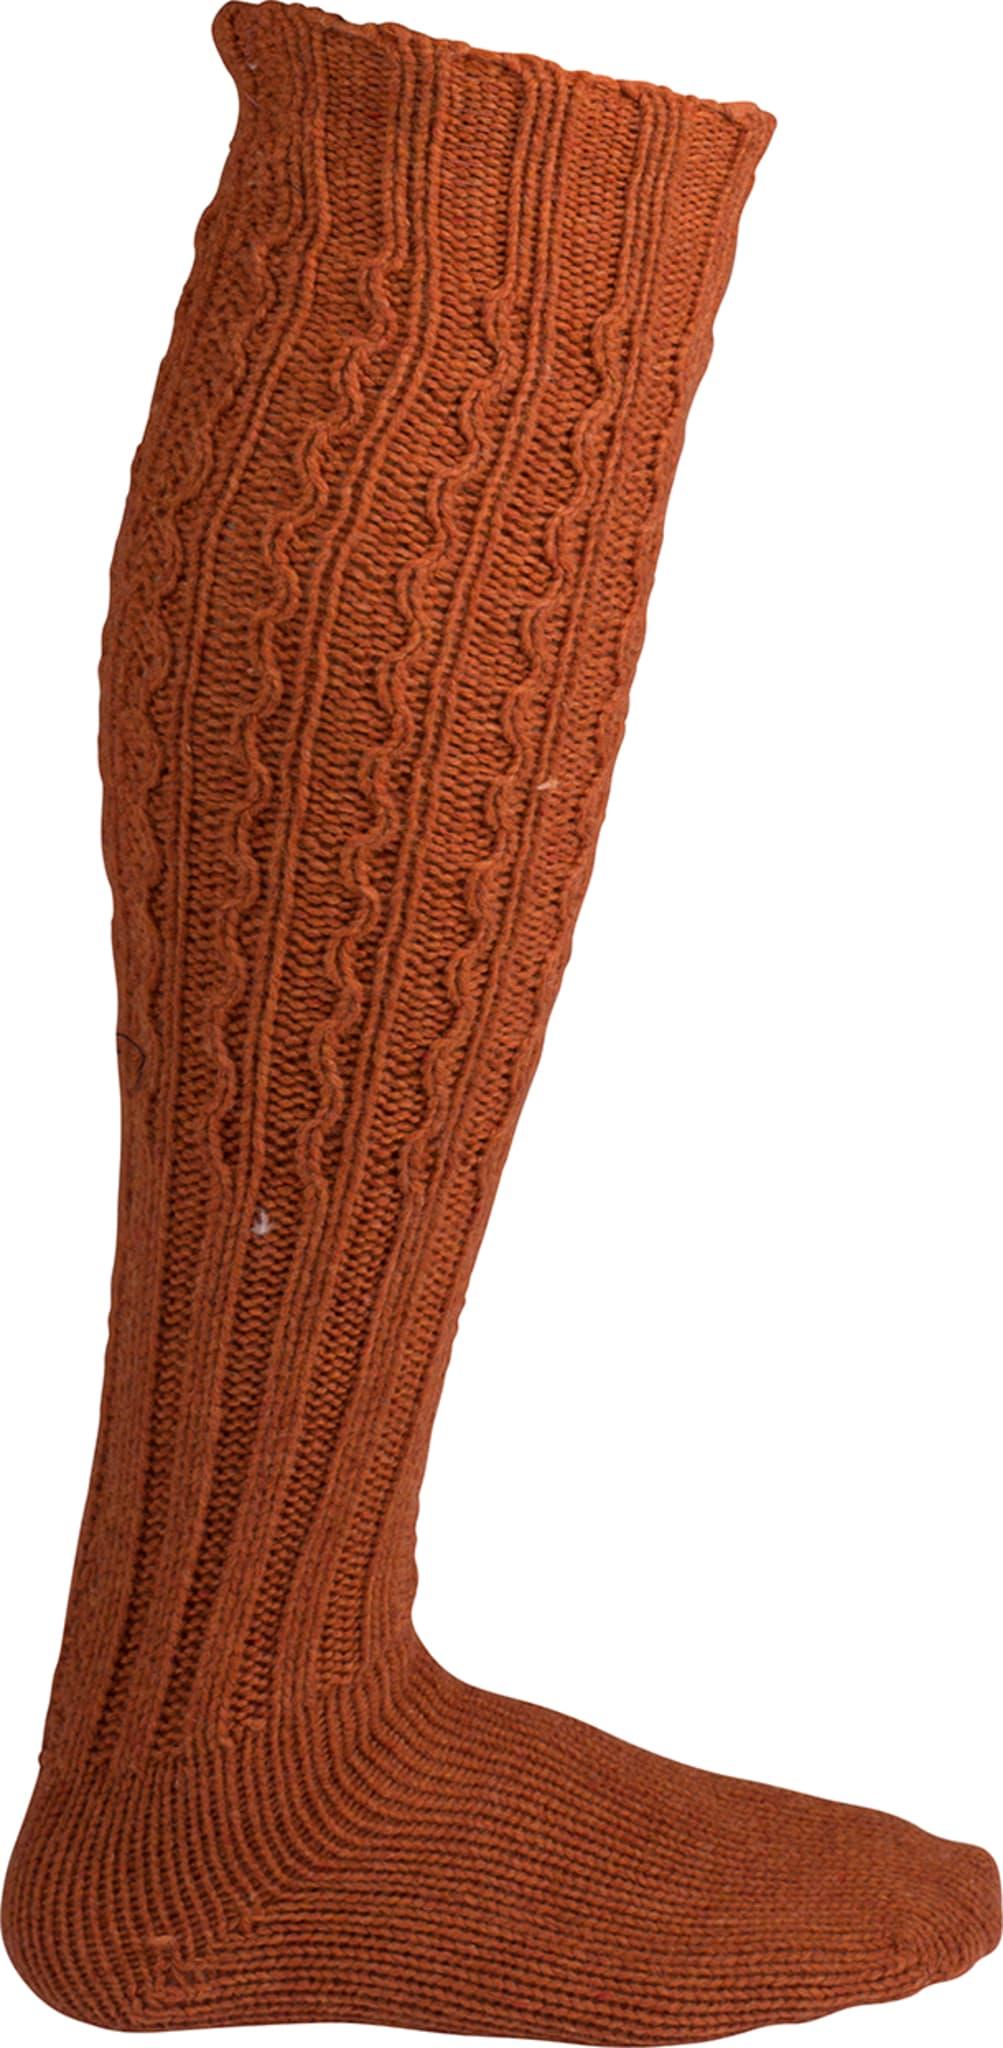 Amundsen Traditional Sock Unisex